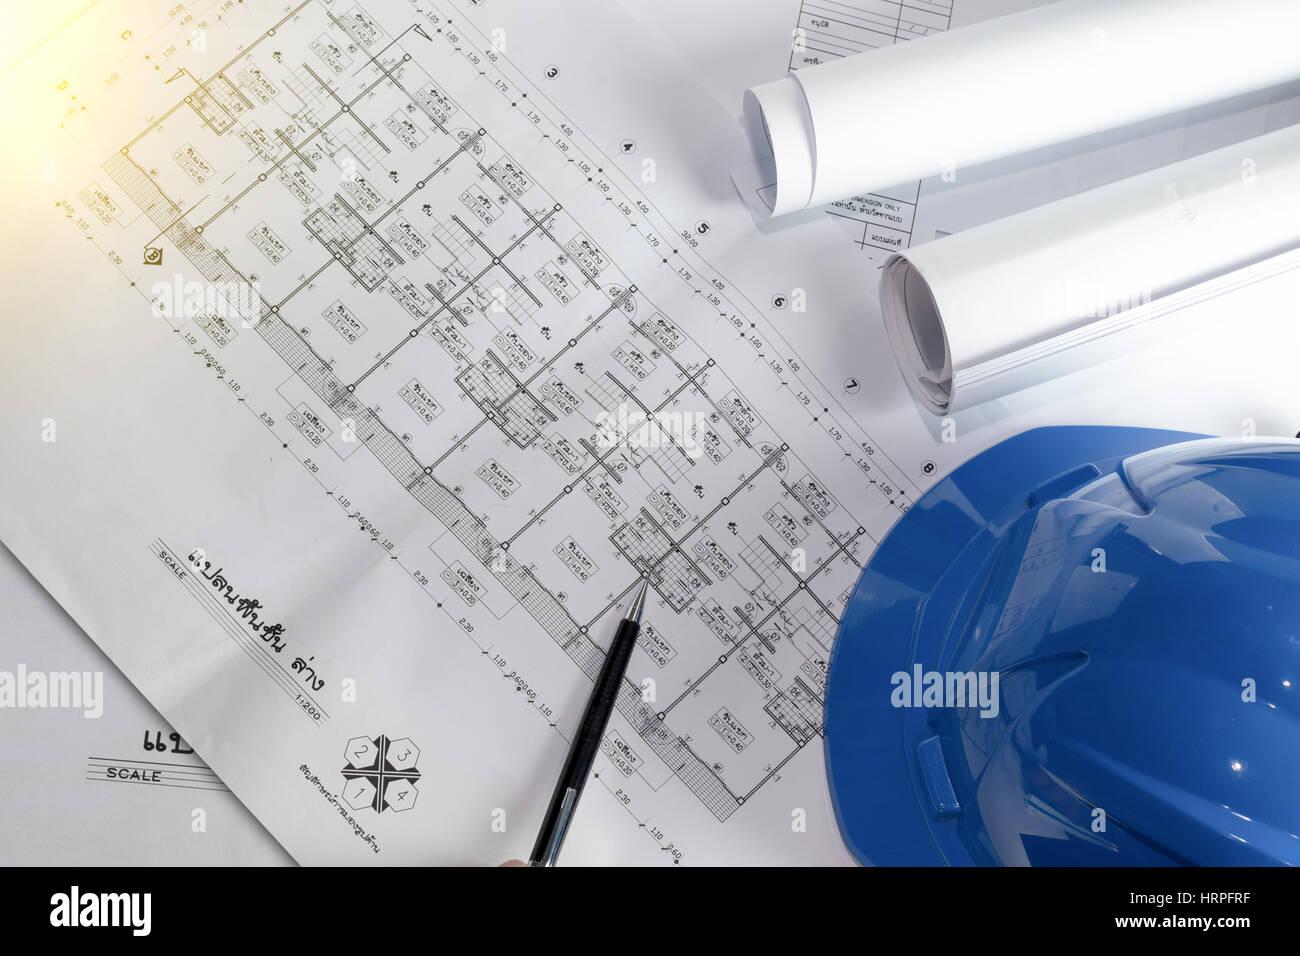 Engineering diagram blueprint paper drafting project sketch stock engineering diagram blueprint paper drafting project sketch architecturalselective focus malvernweather Images